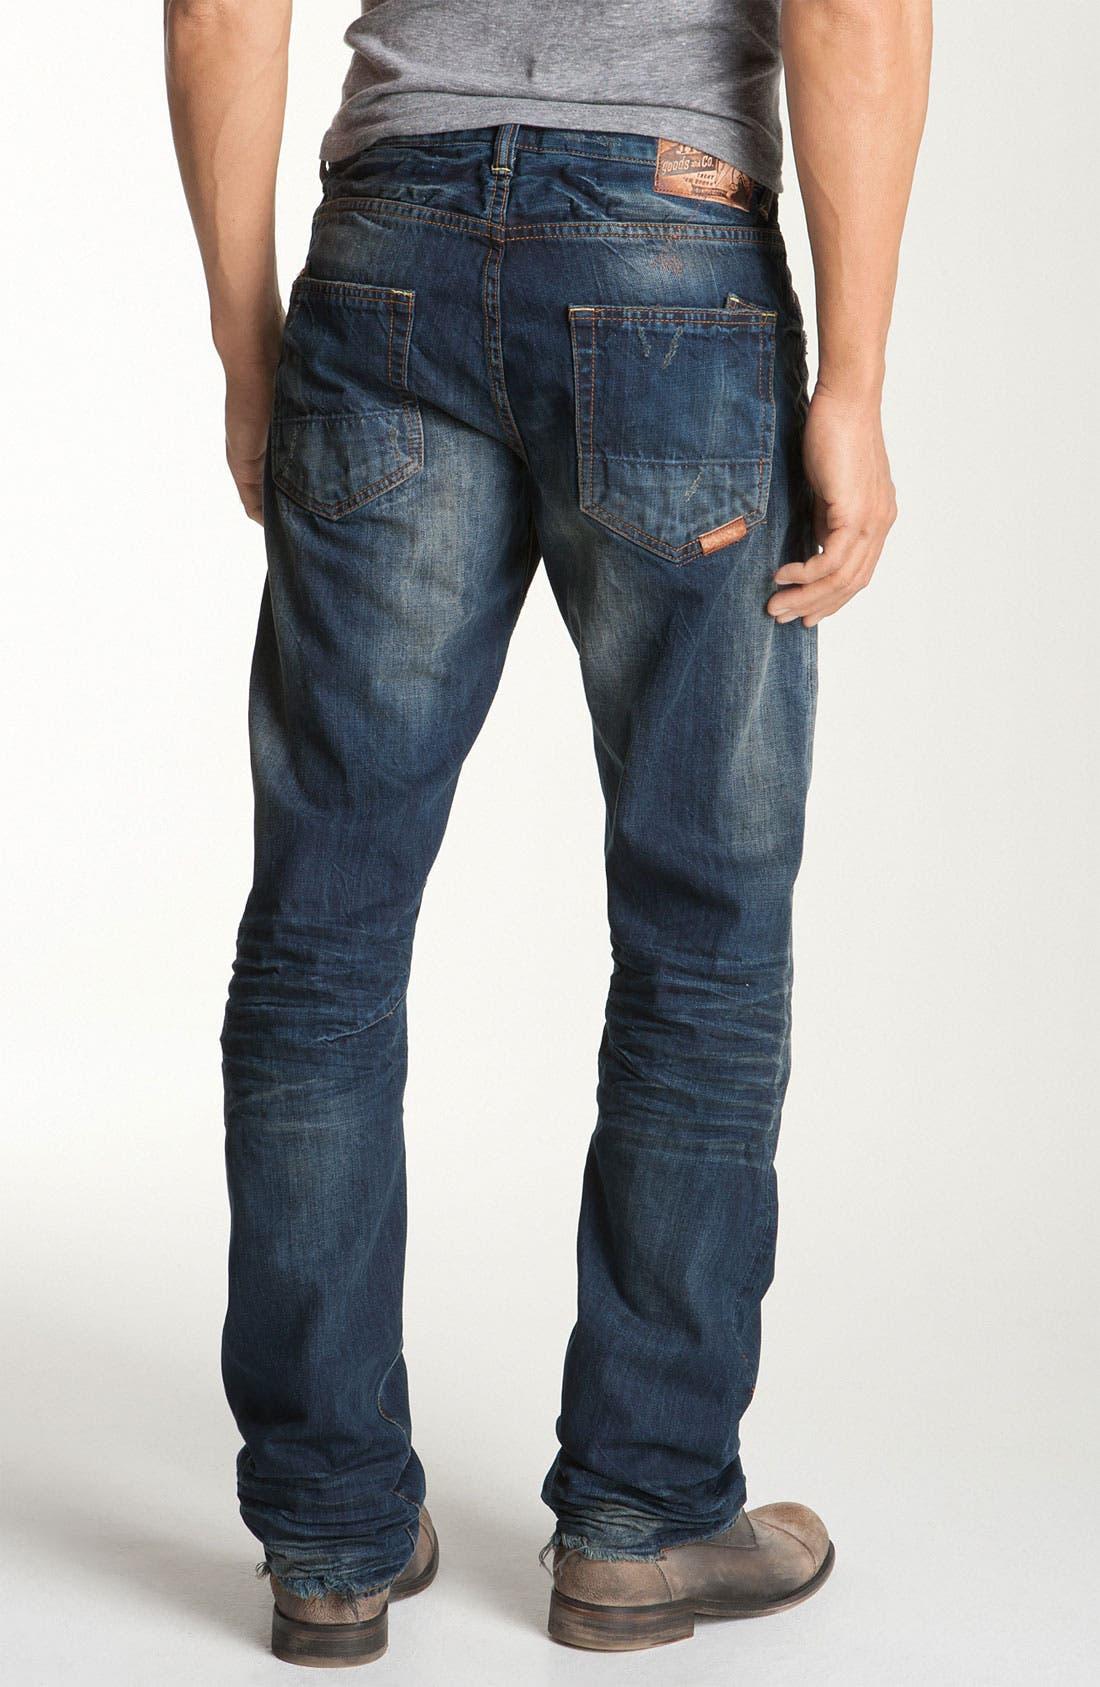 'Barracuda' Straight Leg Jeans,                             Main thumbnail 1, color,                             481